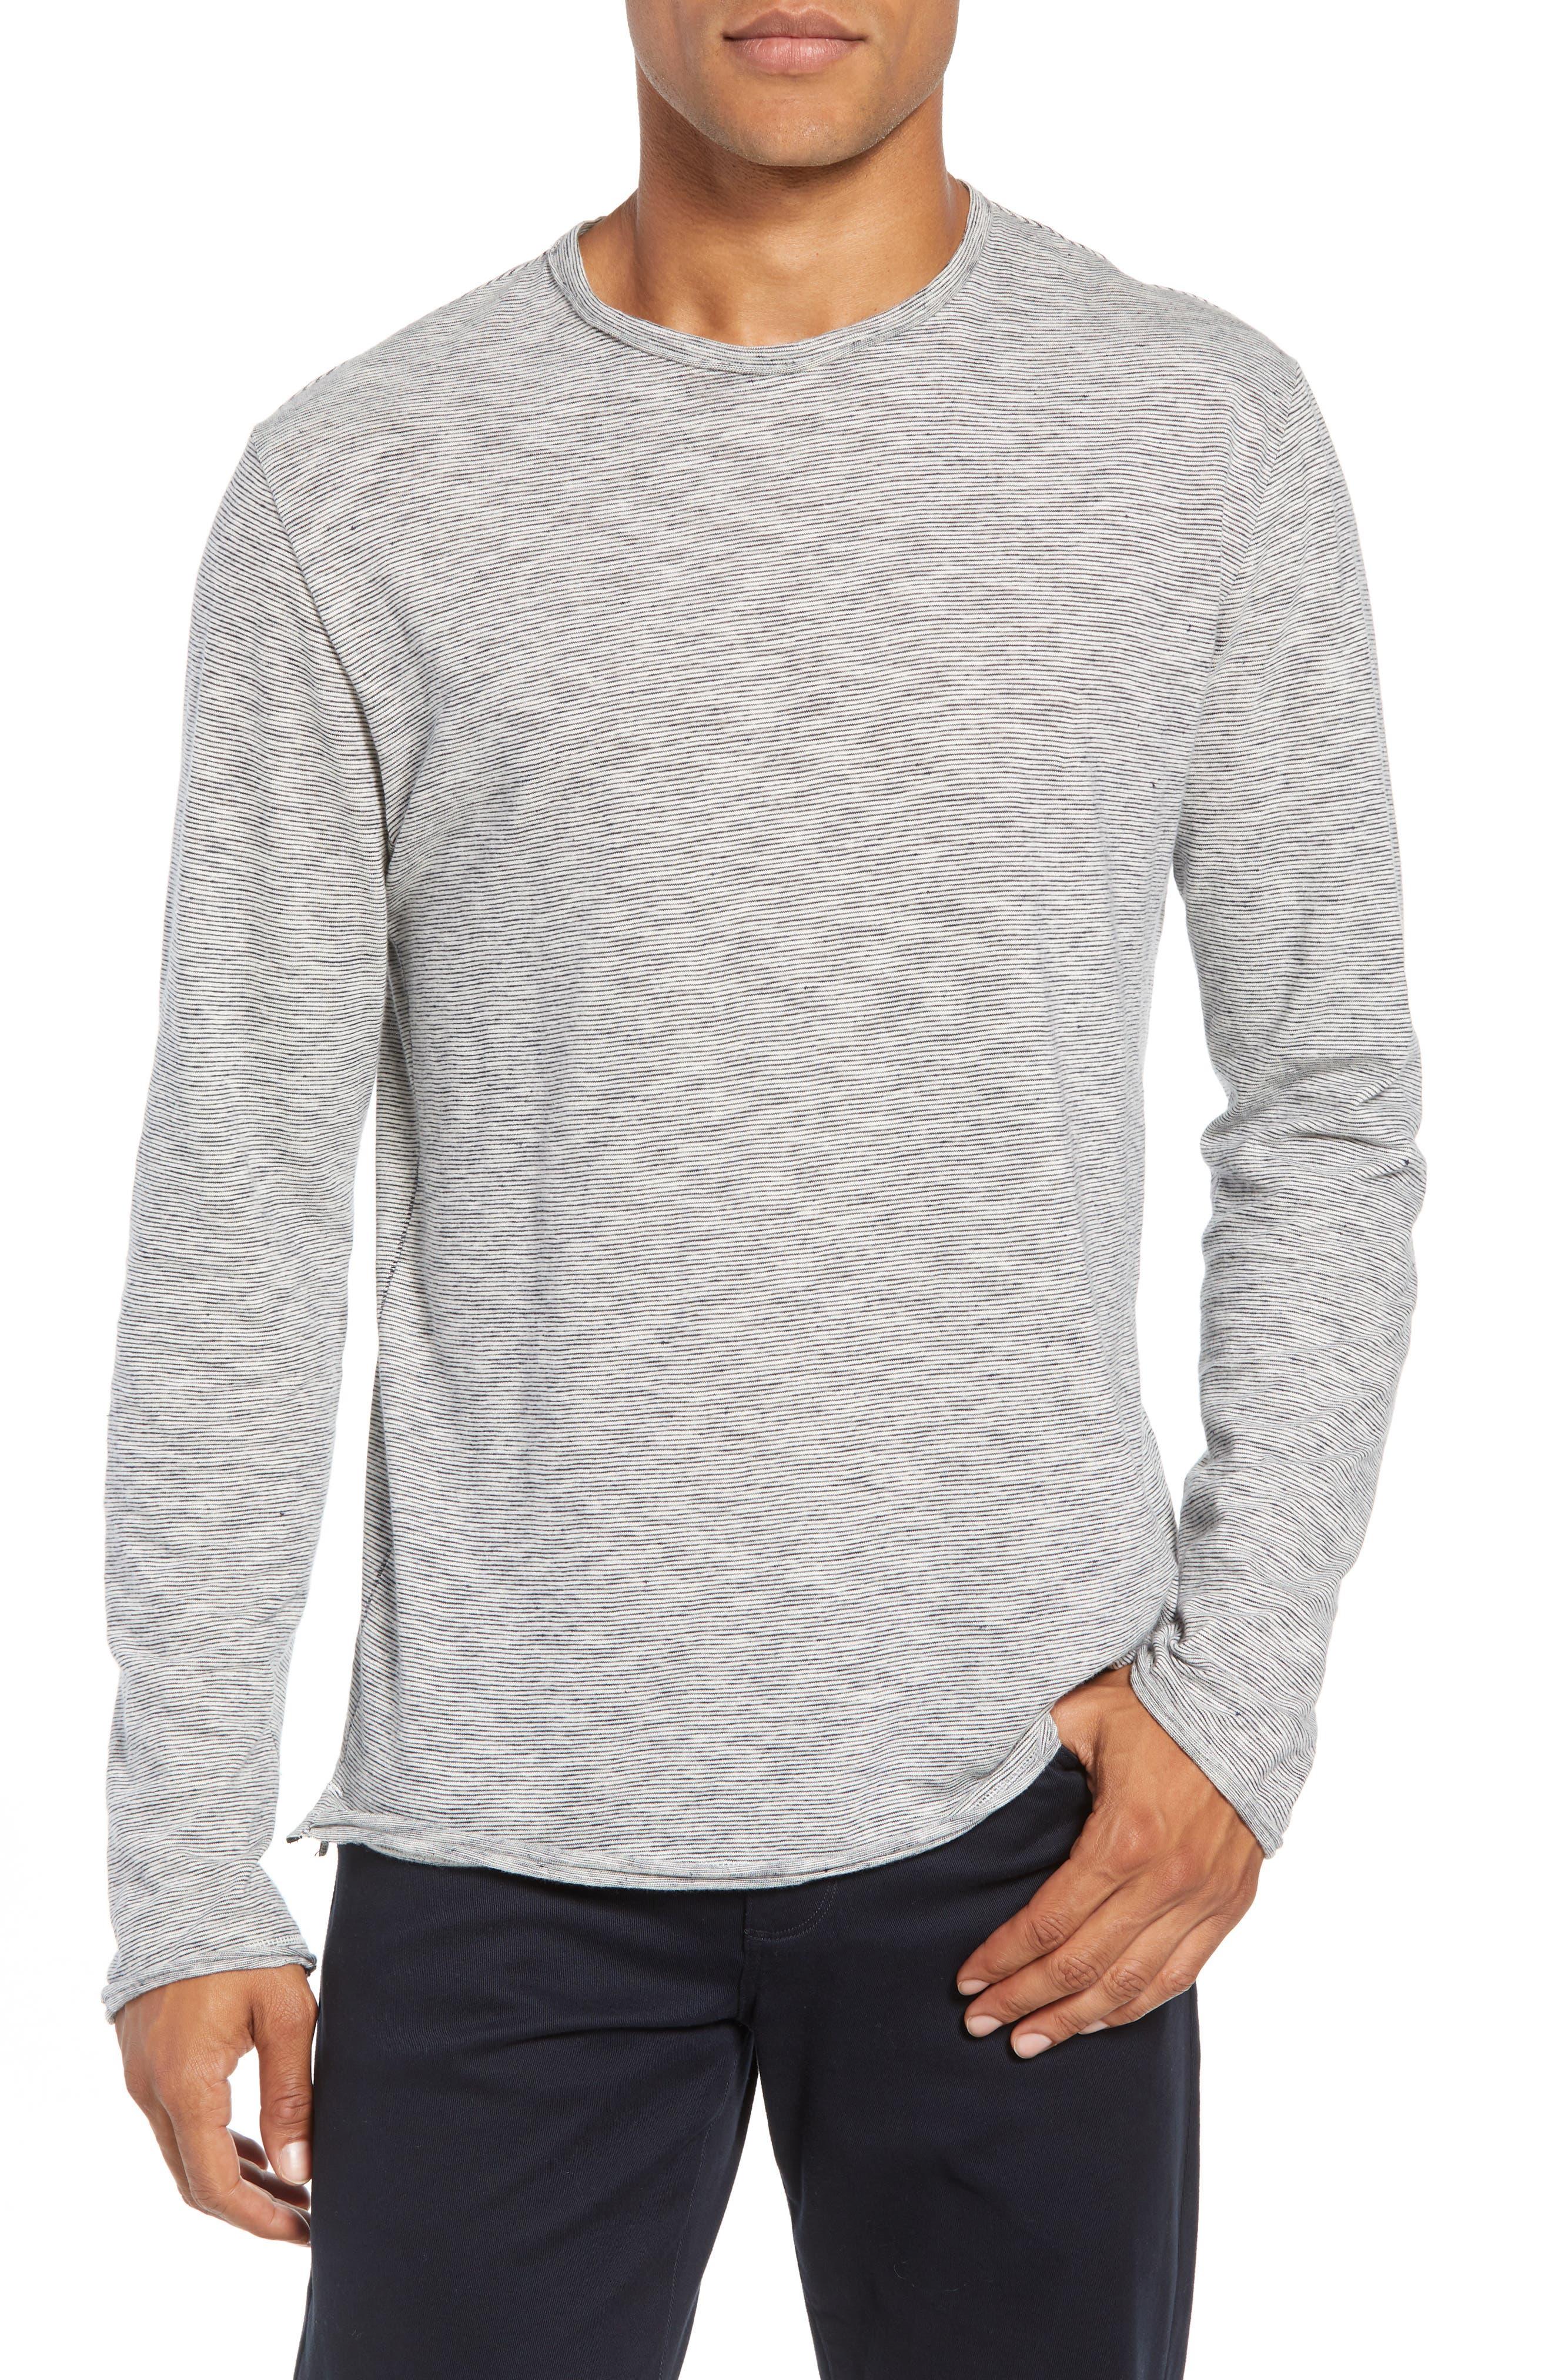 Owen T-Shirt,                         Main,                         color, NAVY/ WHITE